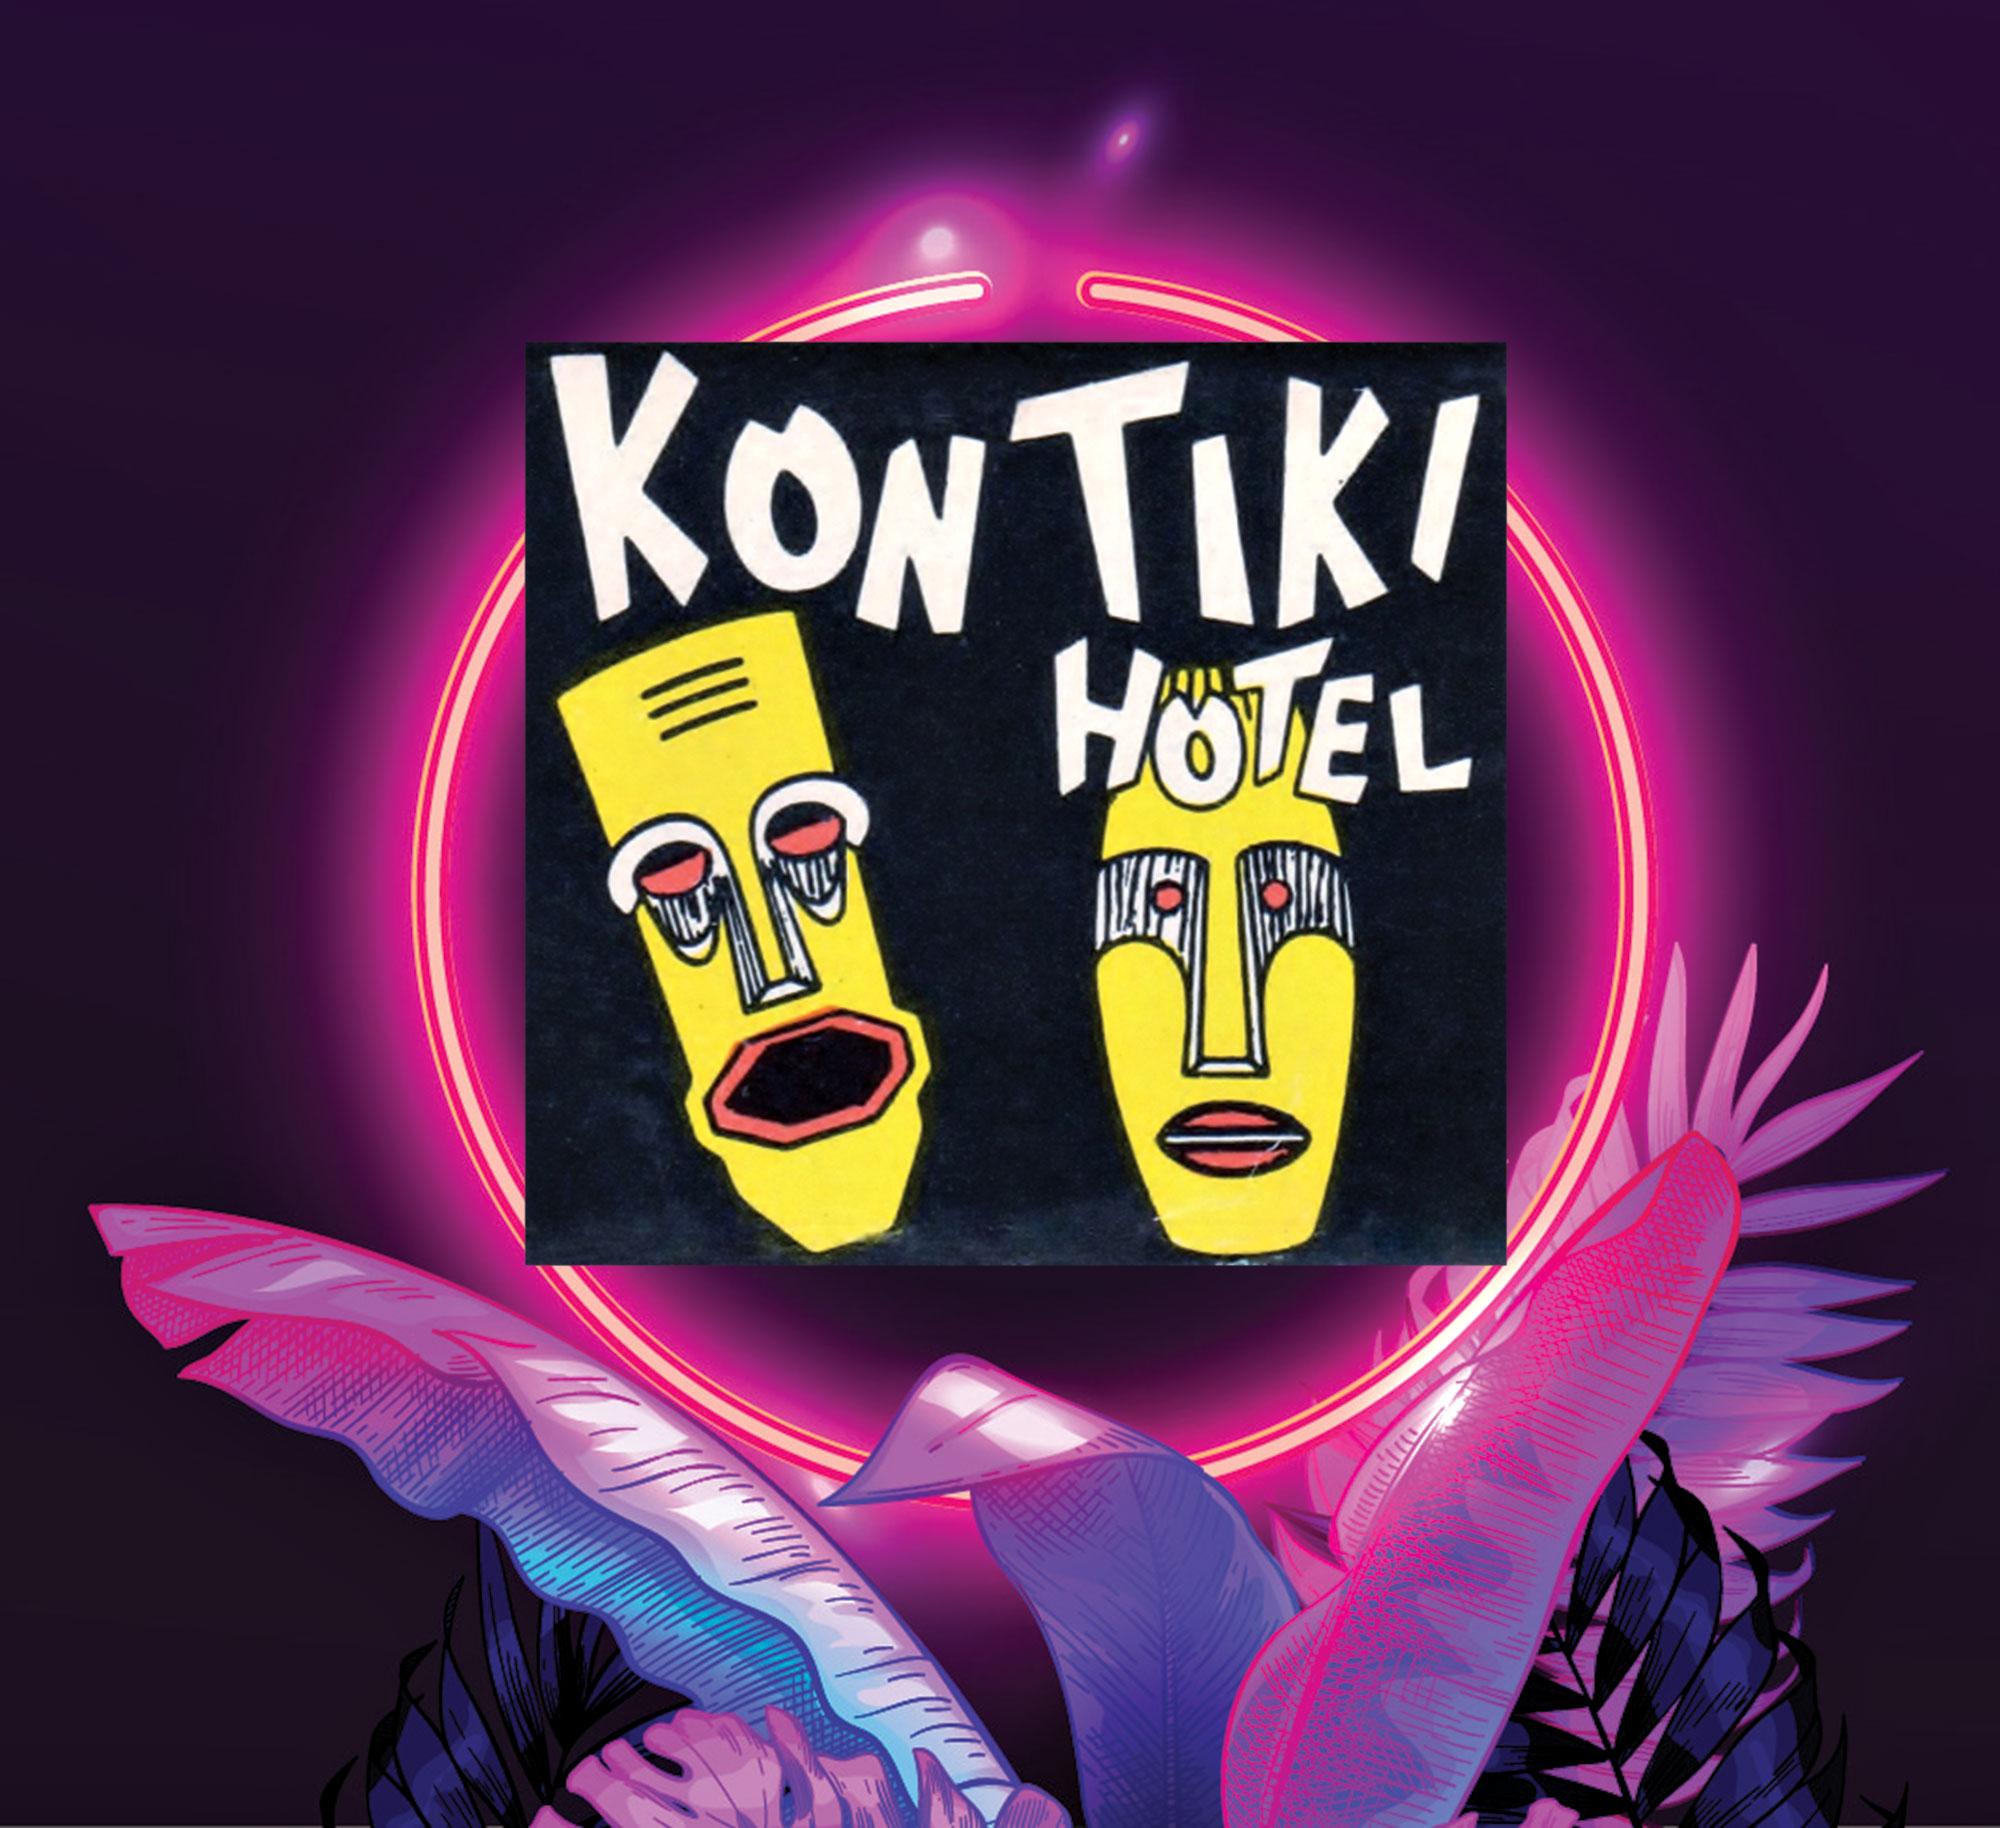 matchbook cover from the Kon Tiki Hotel; Photo courtesy Douglas Towne